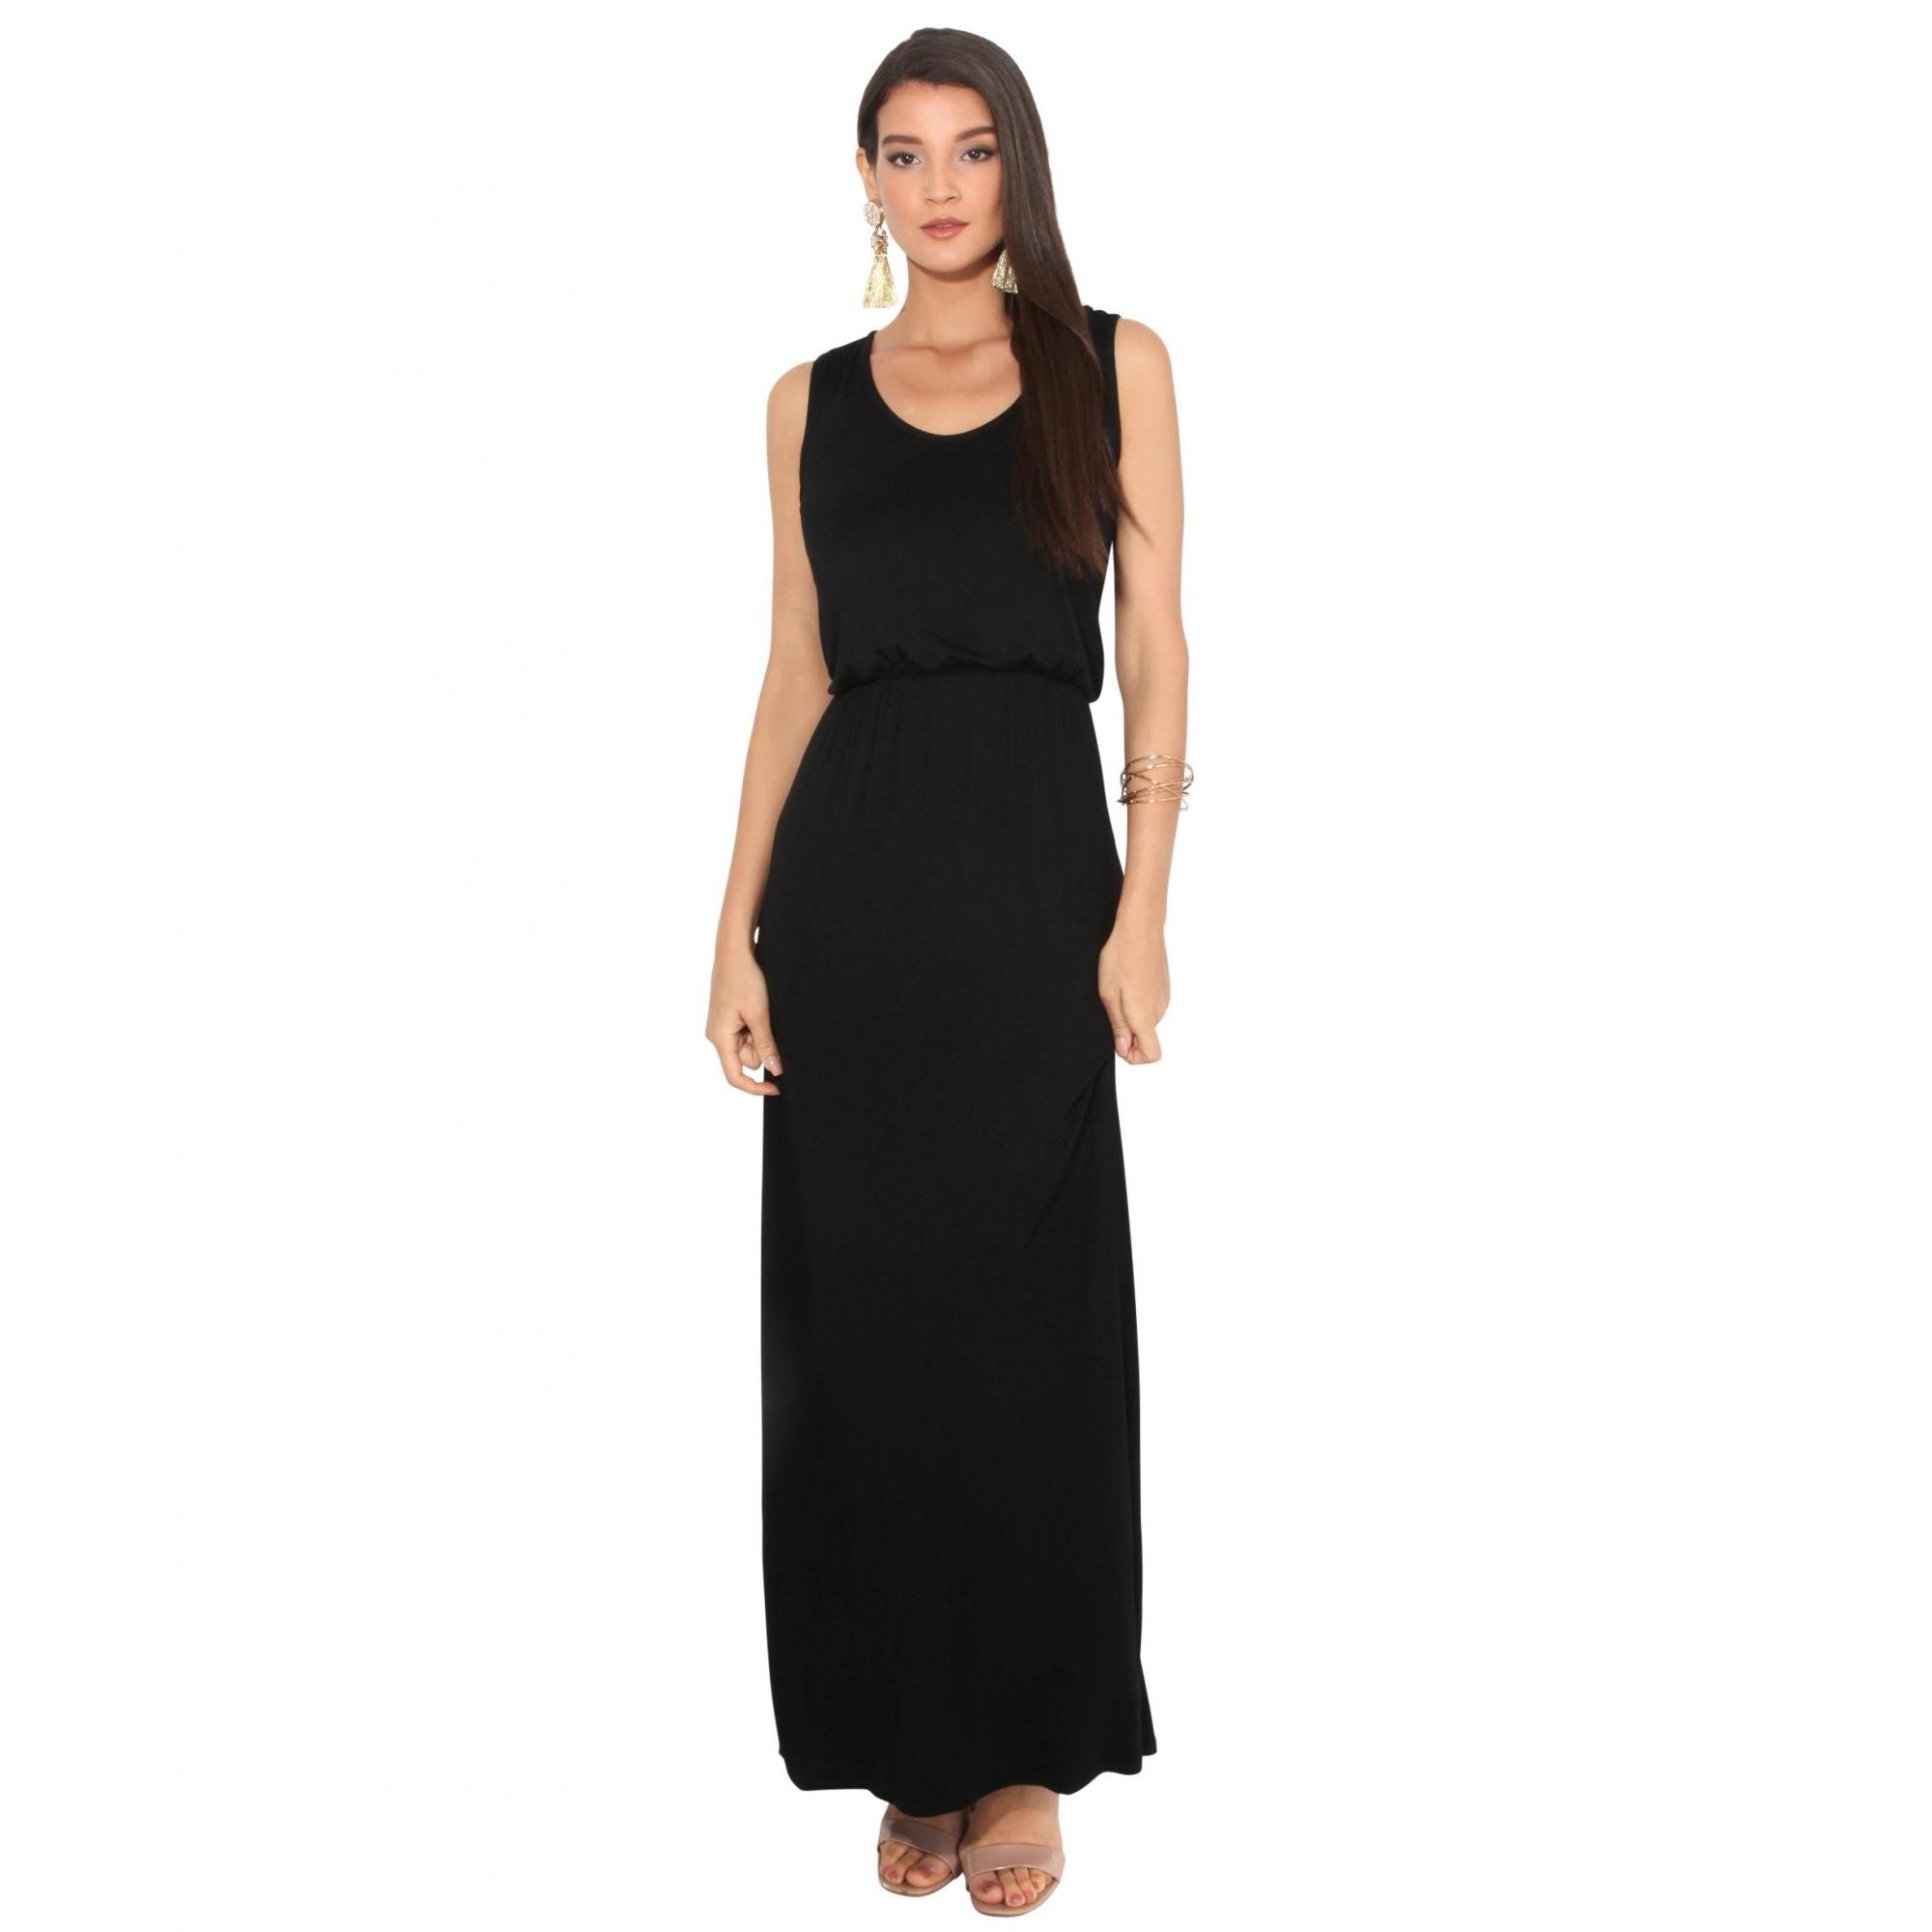 Krisp Womens/Ladies Shirred Sleeveless Maxi Dress (10 UK) (Black)